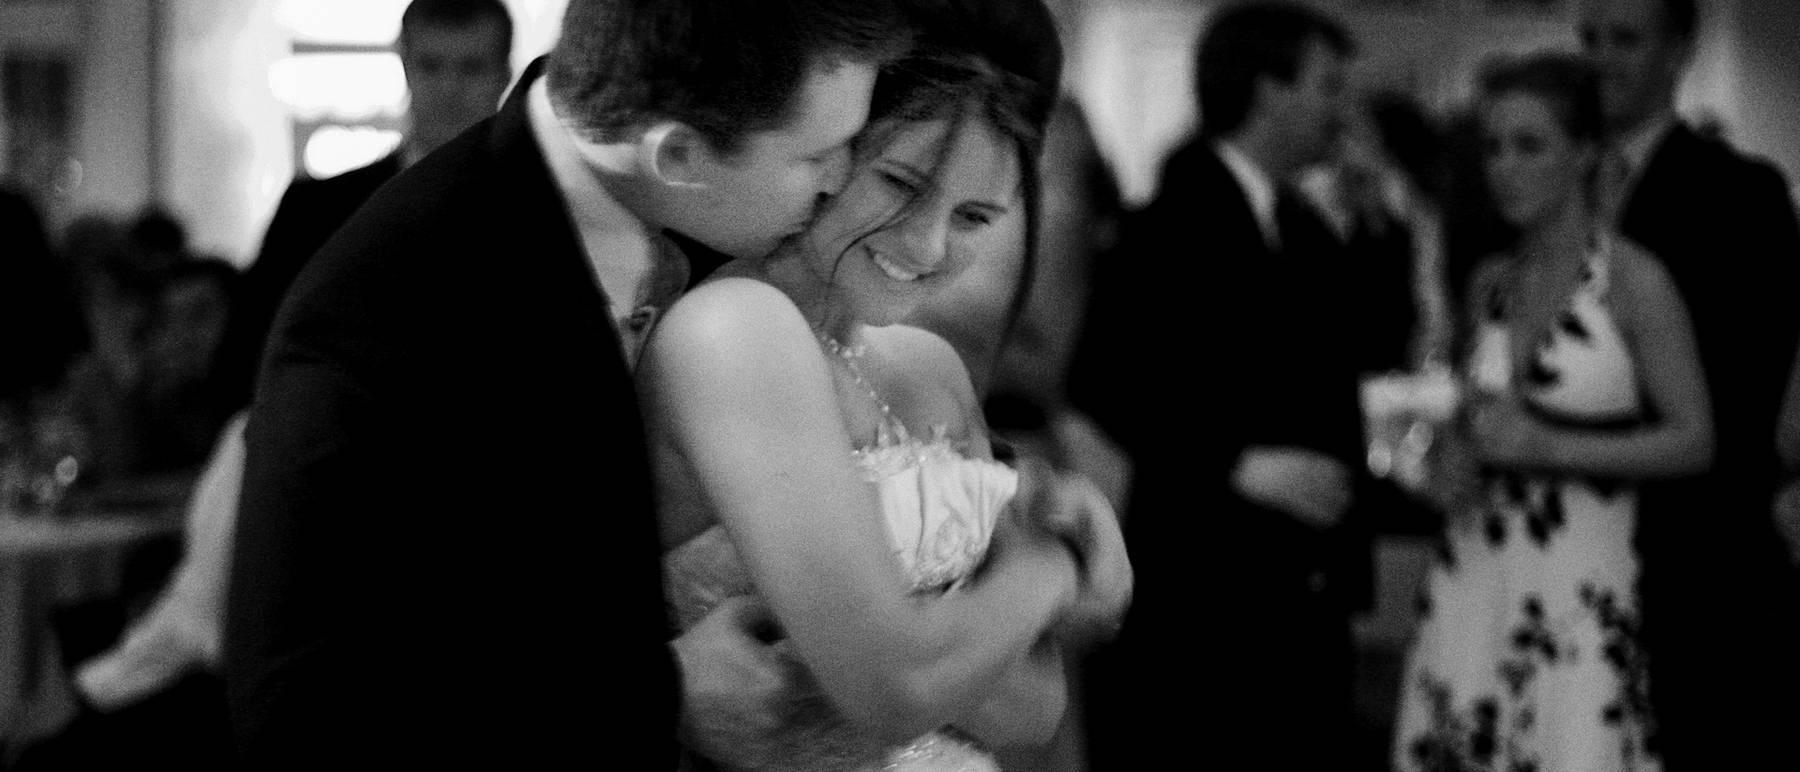 johnandjoseph-wedding-photographer-hz-slider-377